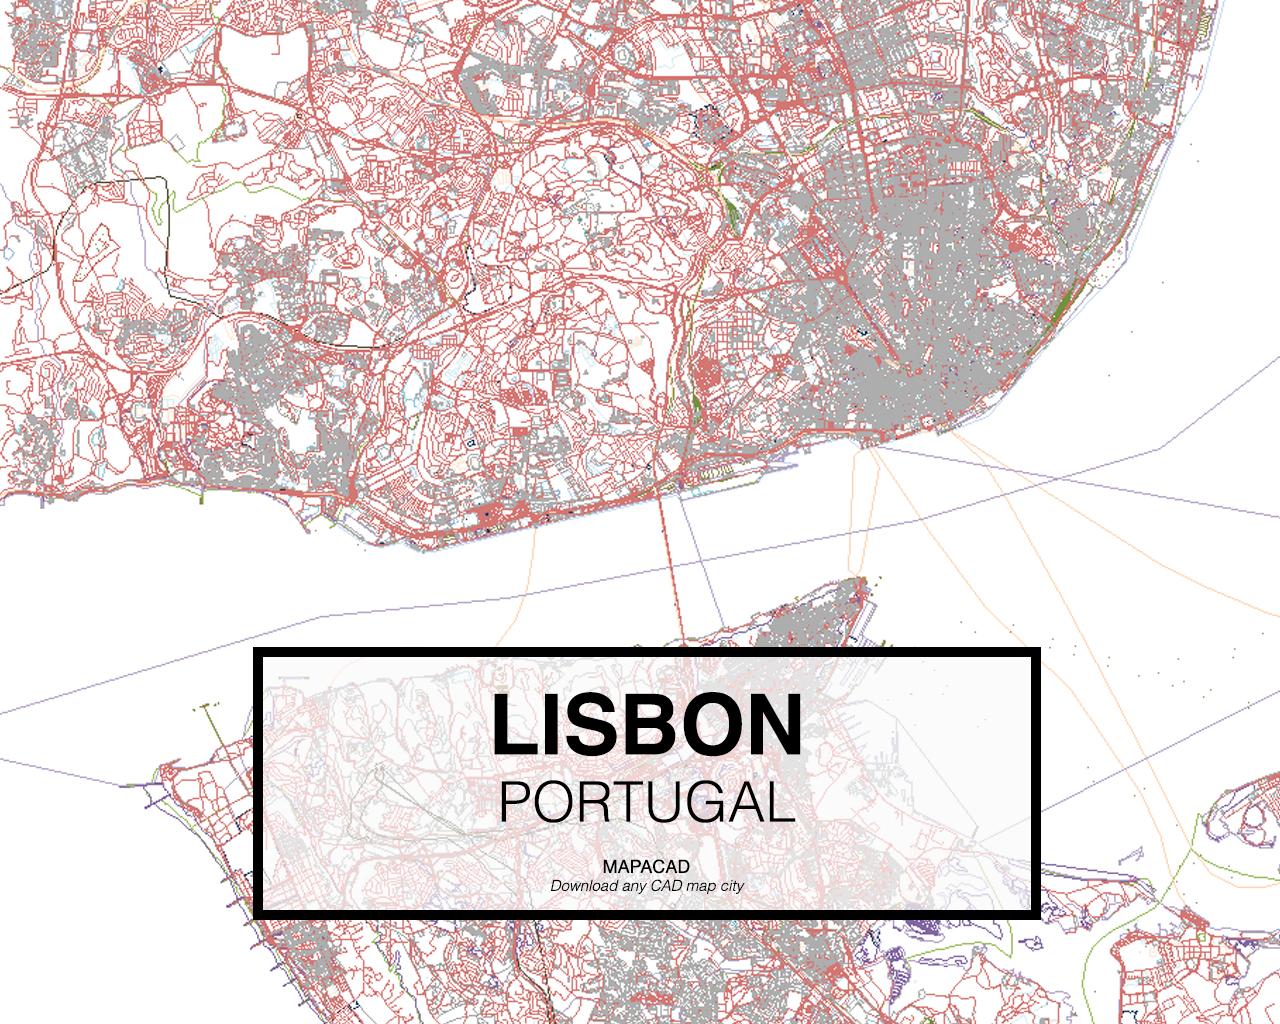 mapa portugal dwg Download Porto DWG   Mapacad mapa portugal dwg